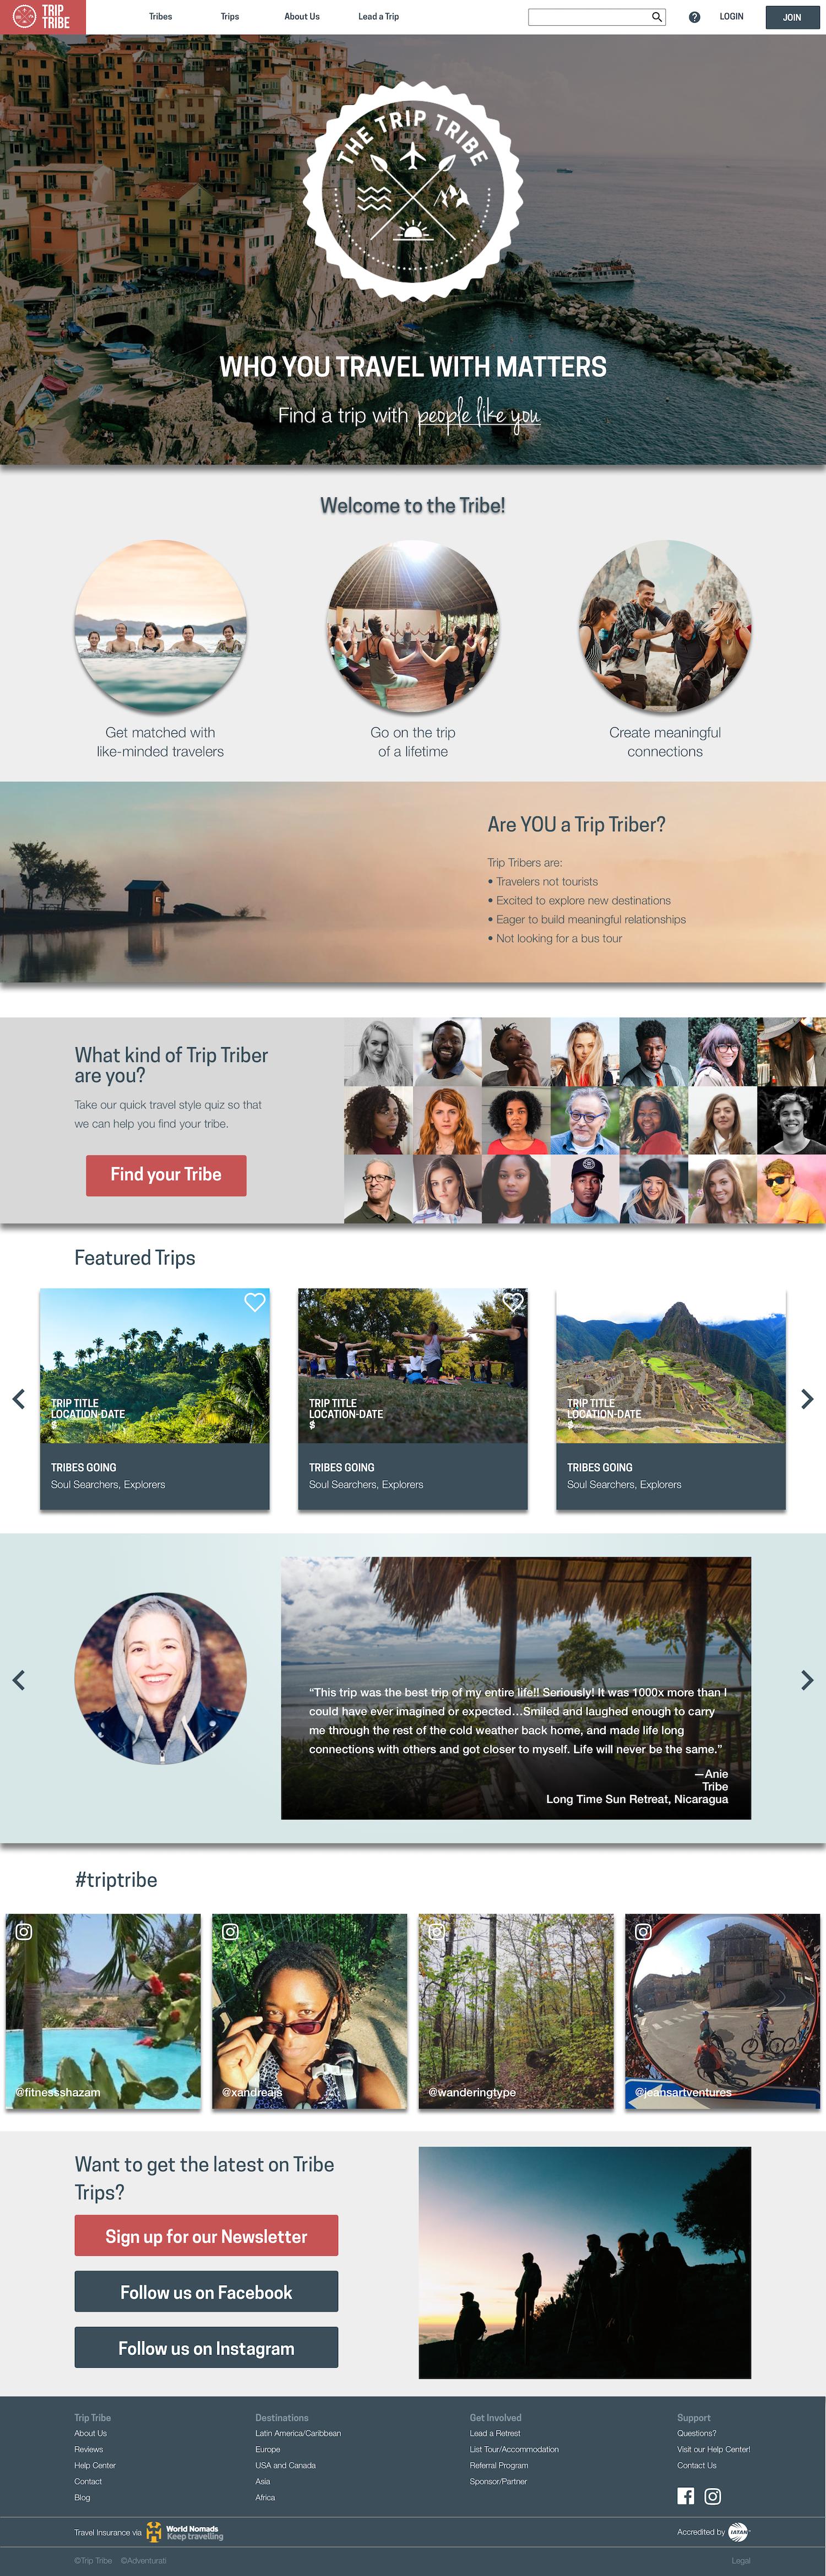 Trip Tribe Homepage.png